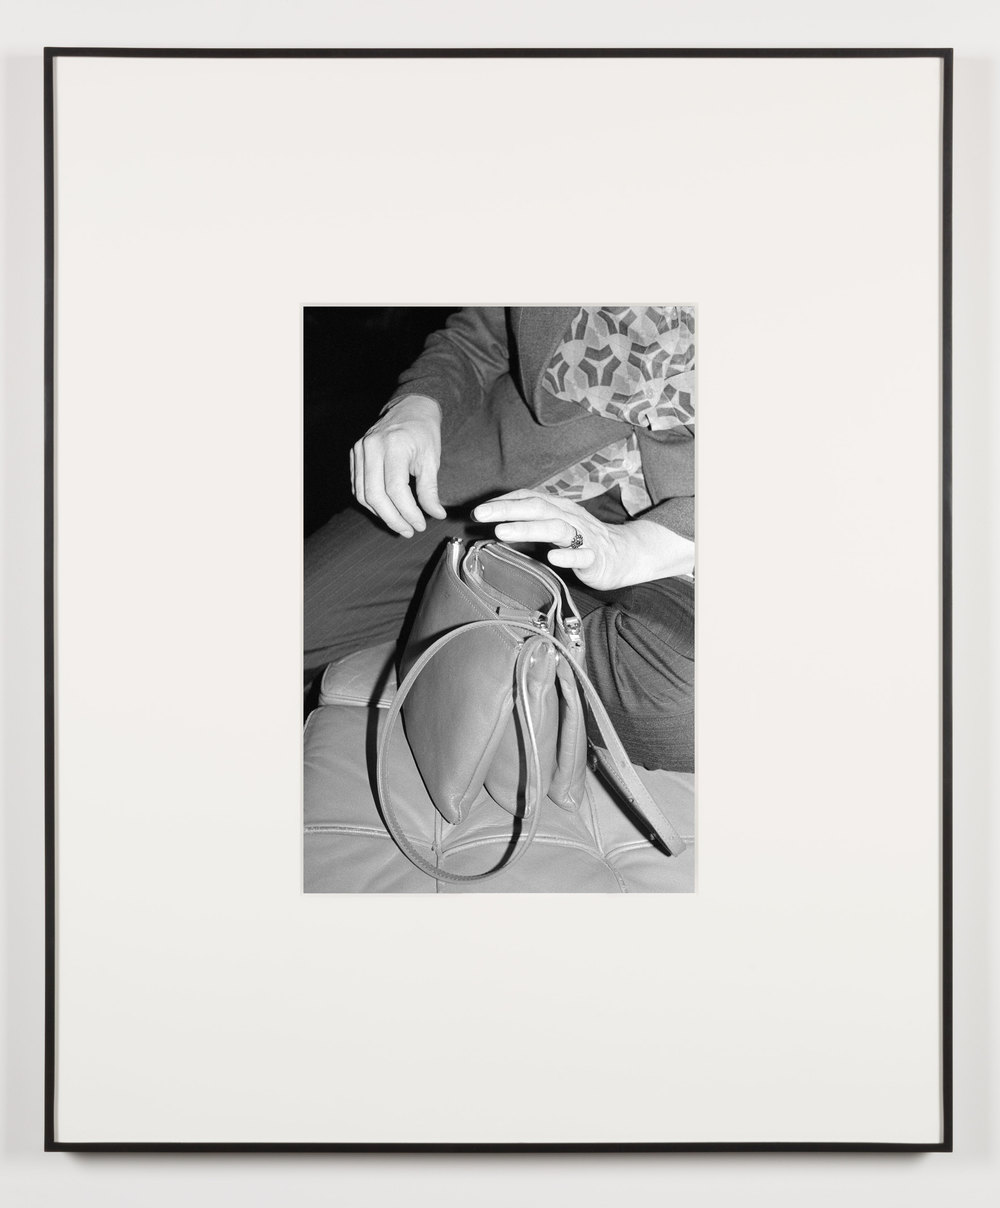 Liberté, Amour, Art (Vienna, Austria, November 22, 2012)    2014   Black and white digital fiber print  20 x 13 1/2 inches   Selected Bodies of Work, 2014